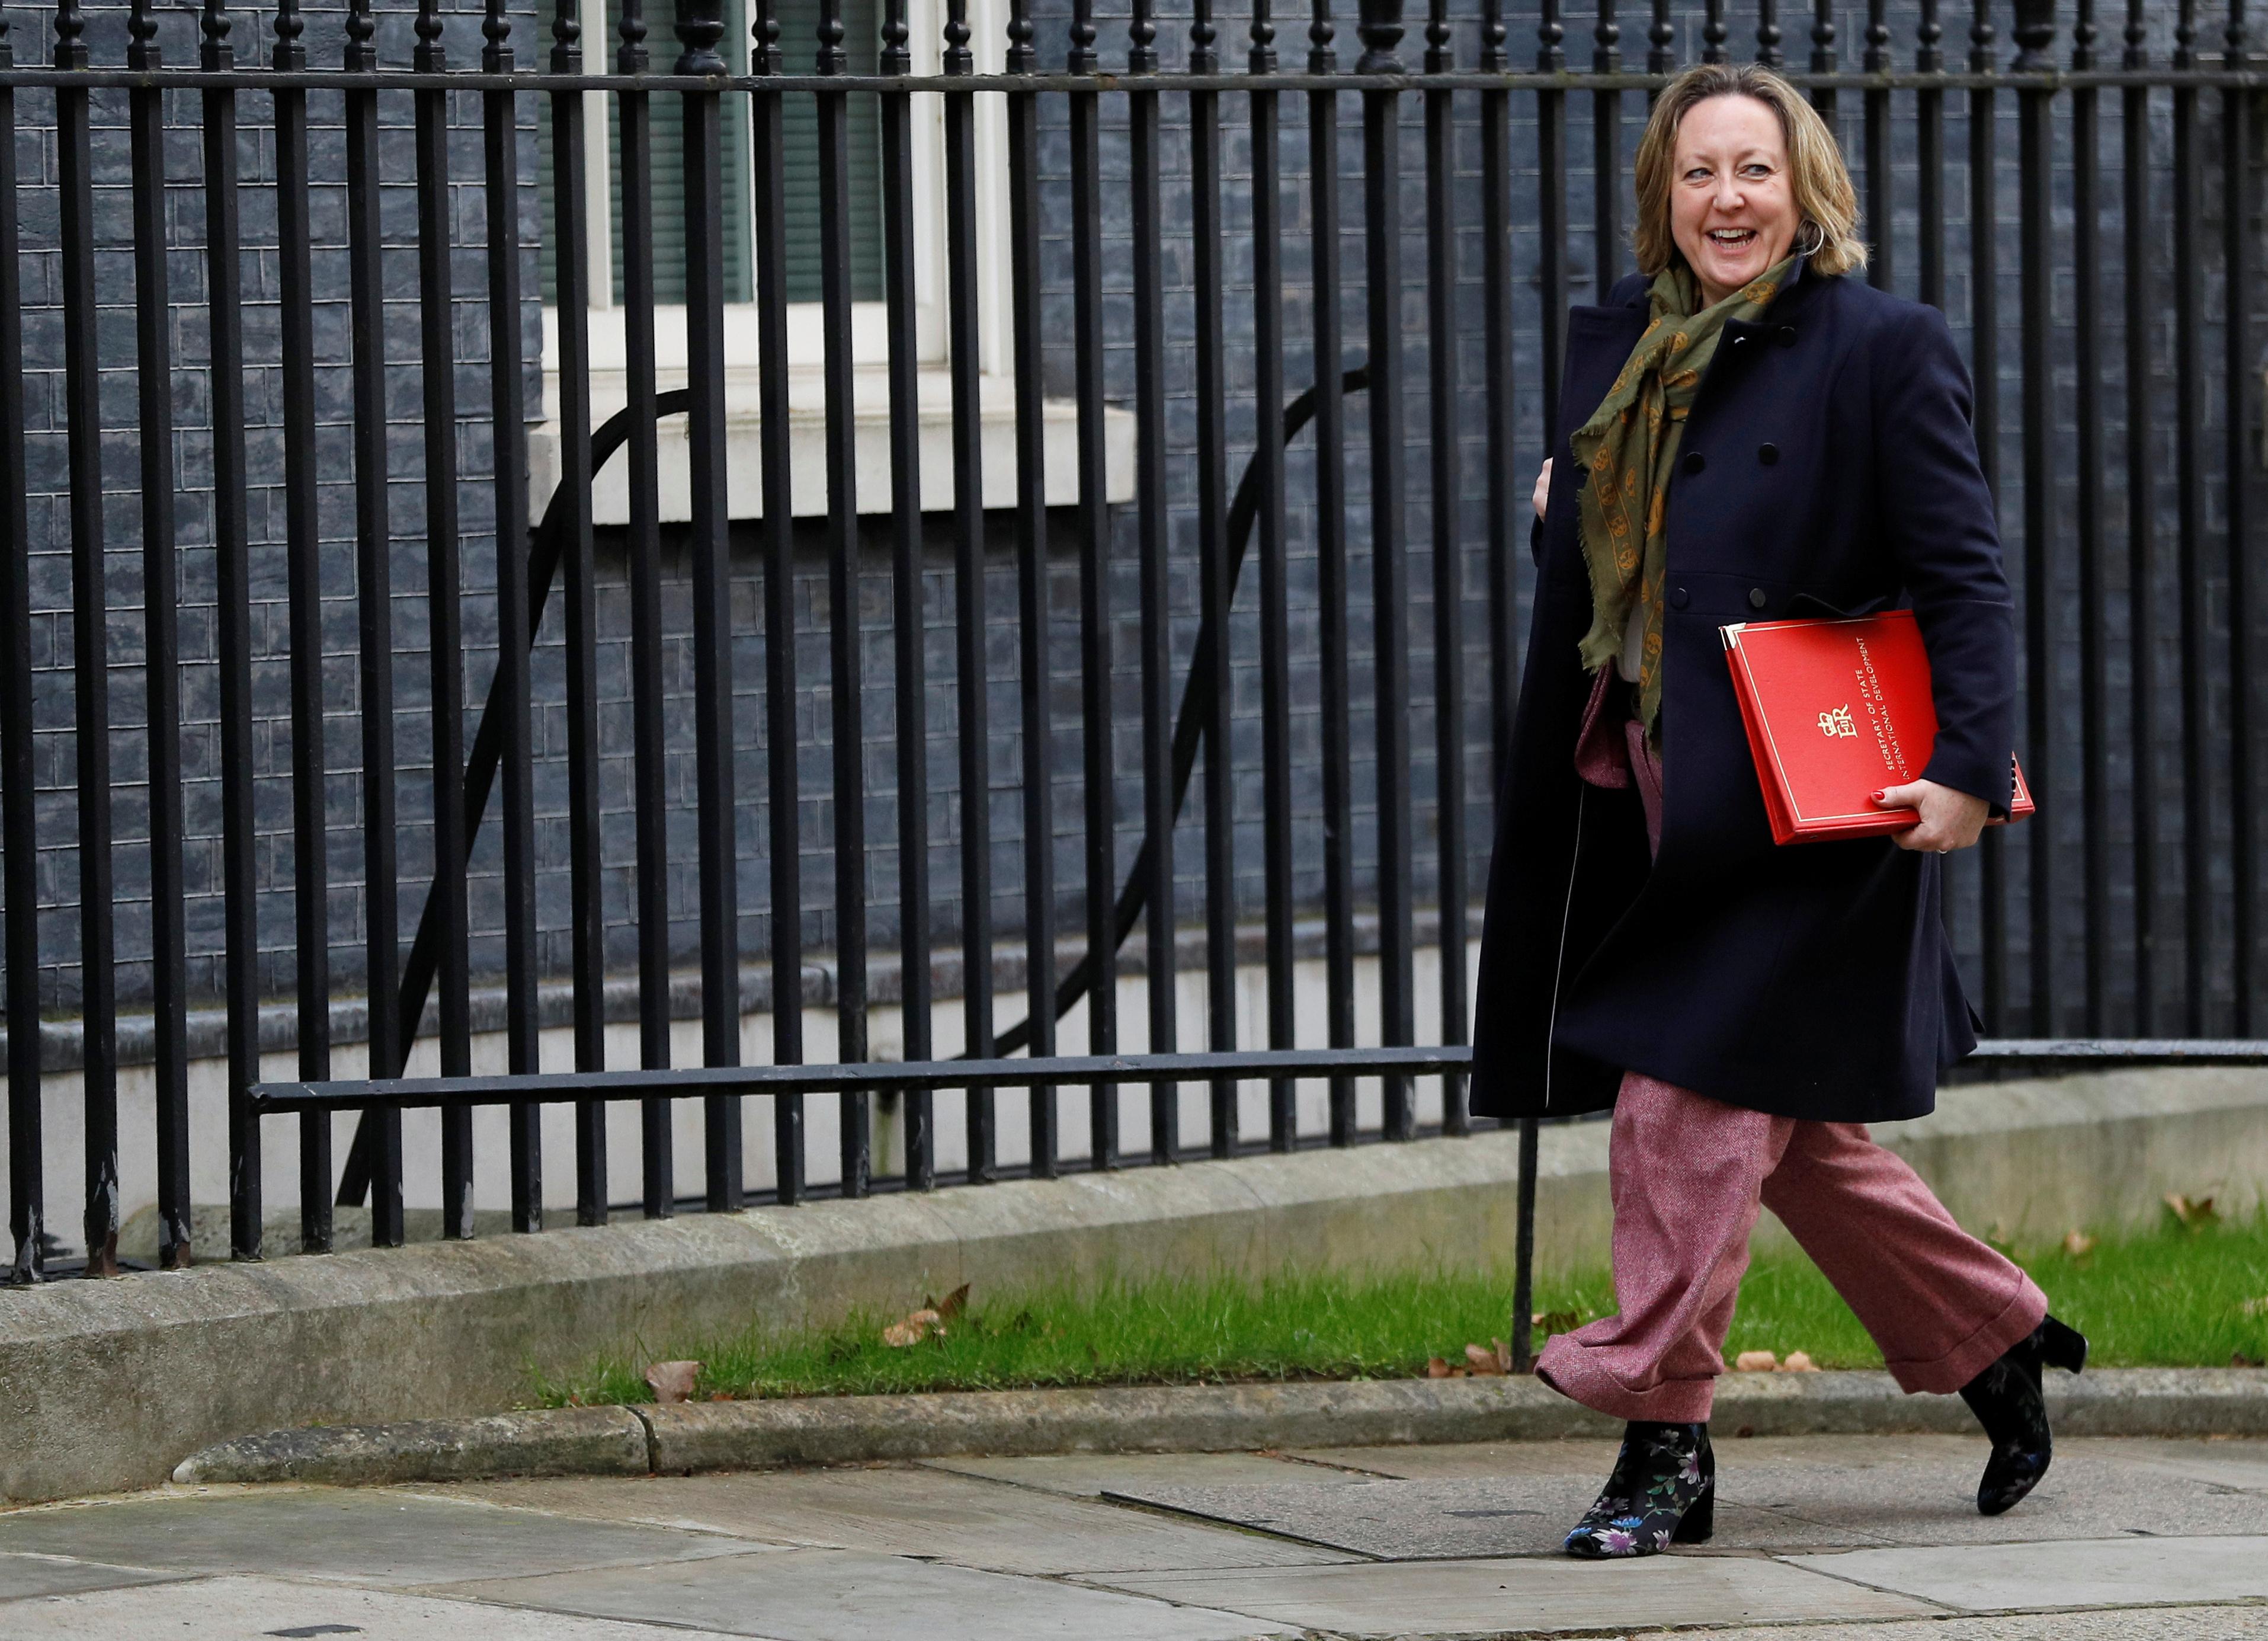 Britain's Secretary of State for International Development Anne-Marie Trevelyan is seen outside Downing Street in London, Britain, February 14, 2020. REUTERS/Peter Nicholls